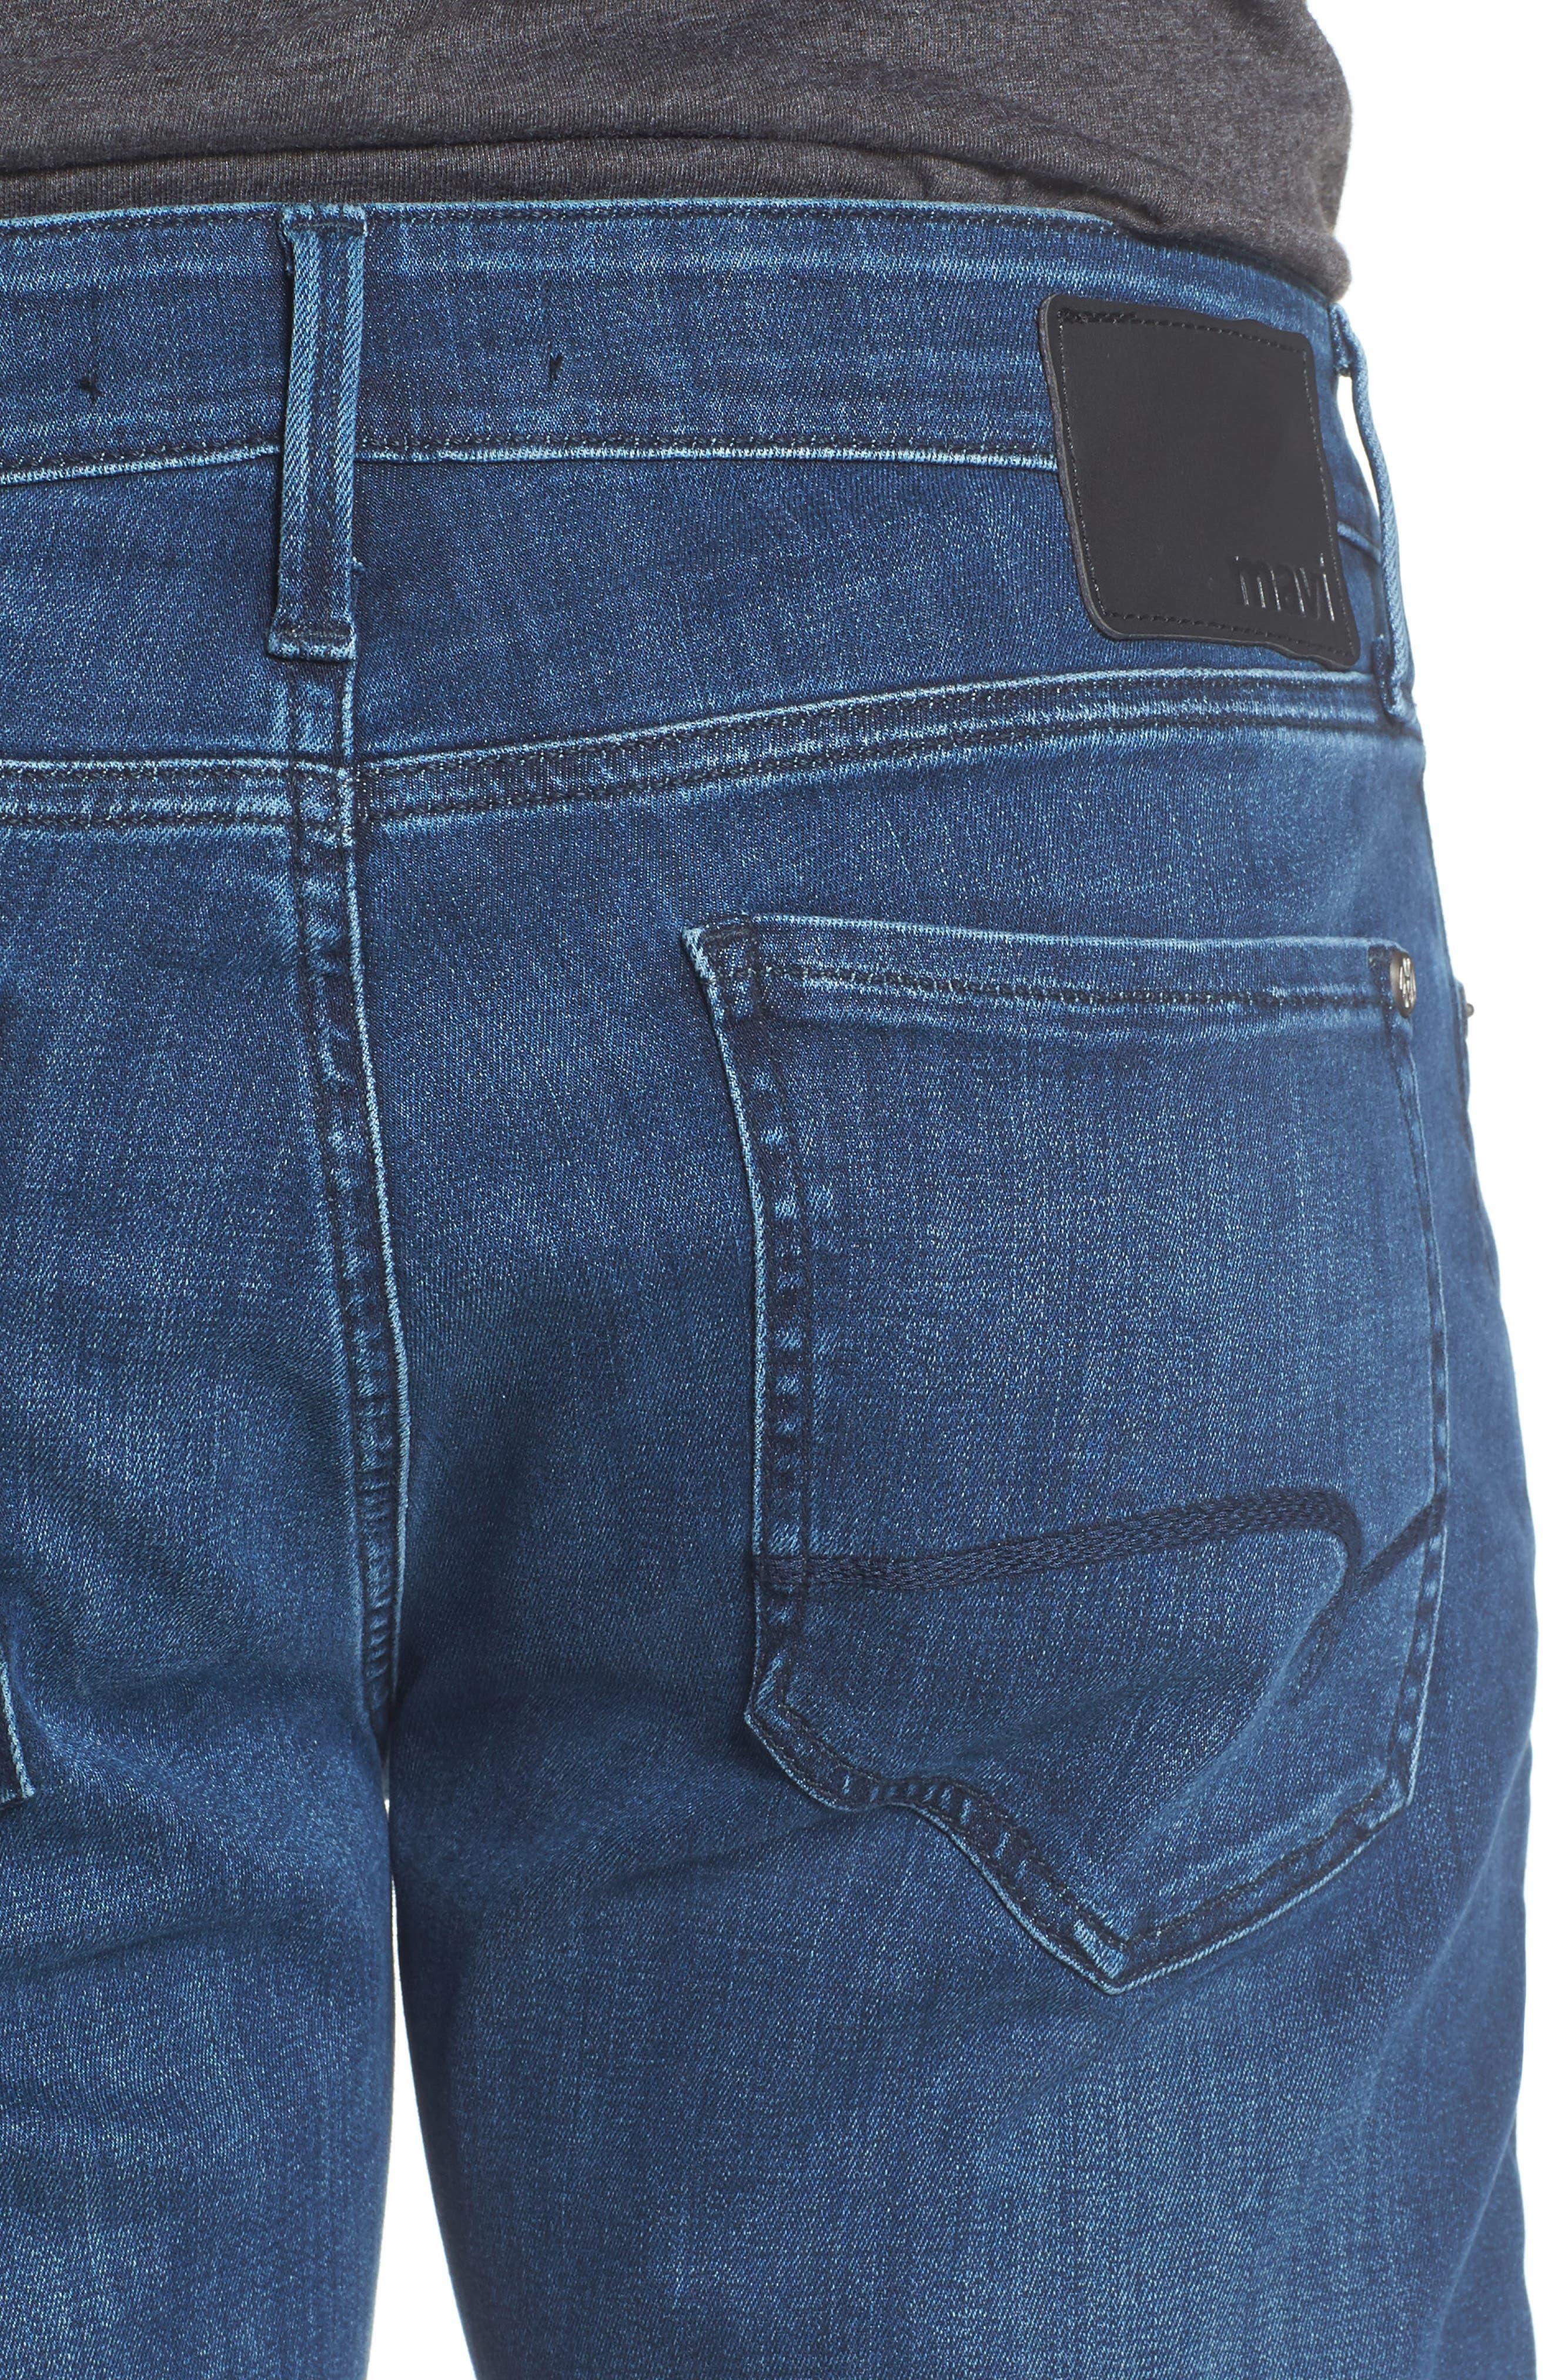 Zach Straight Leg Jeans,                             Alternate thumbnail 4, color,                             Mid Comfort